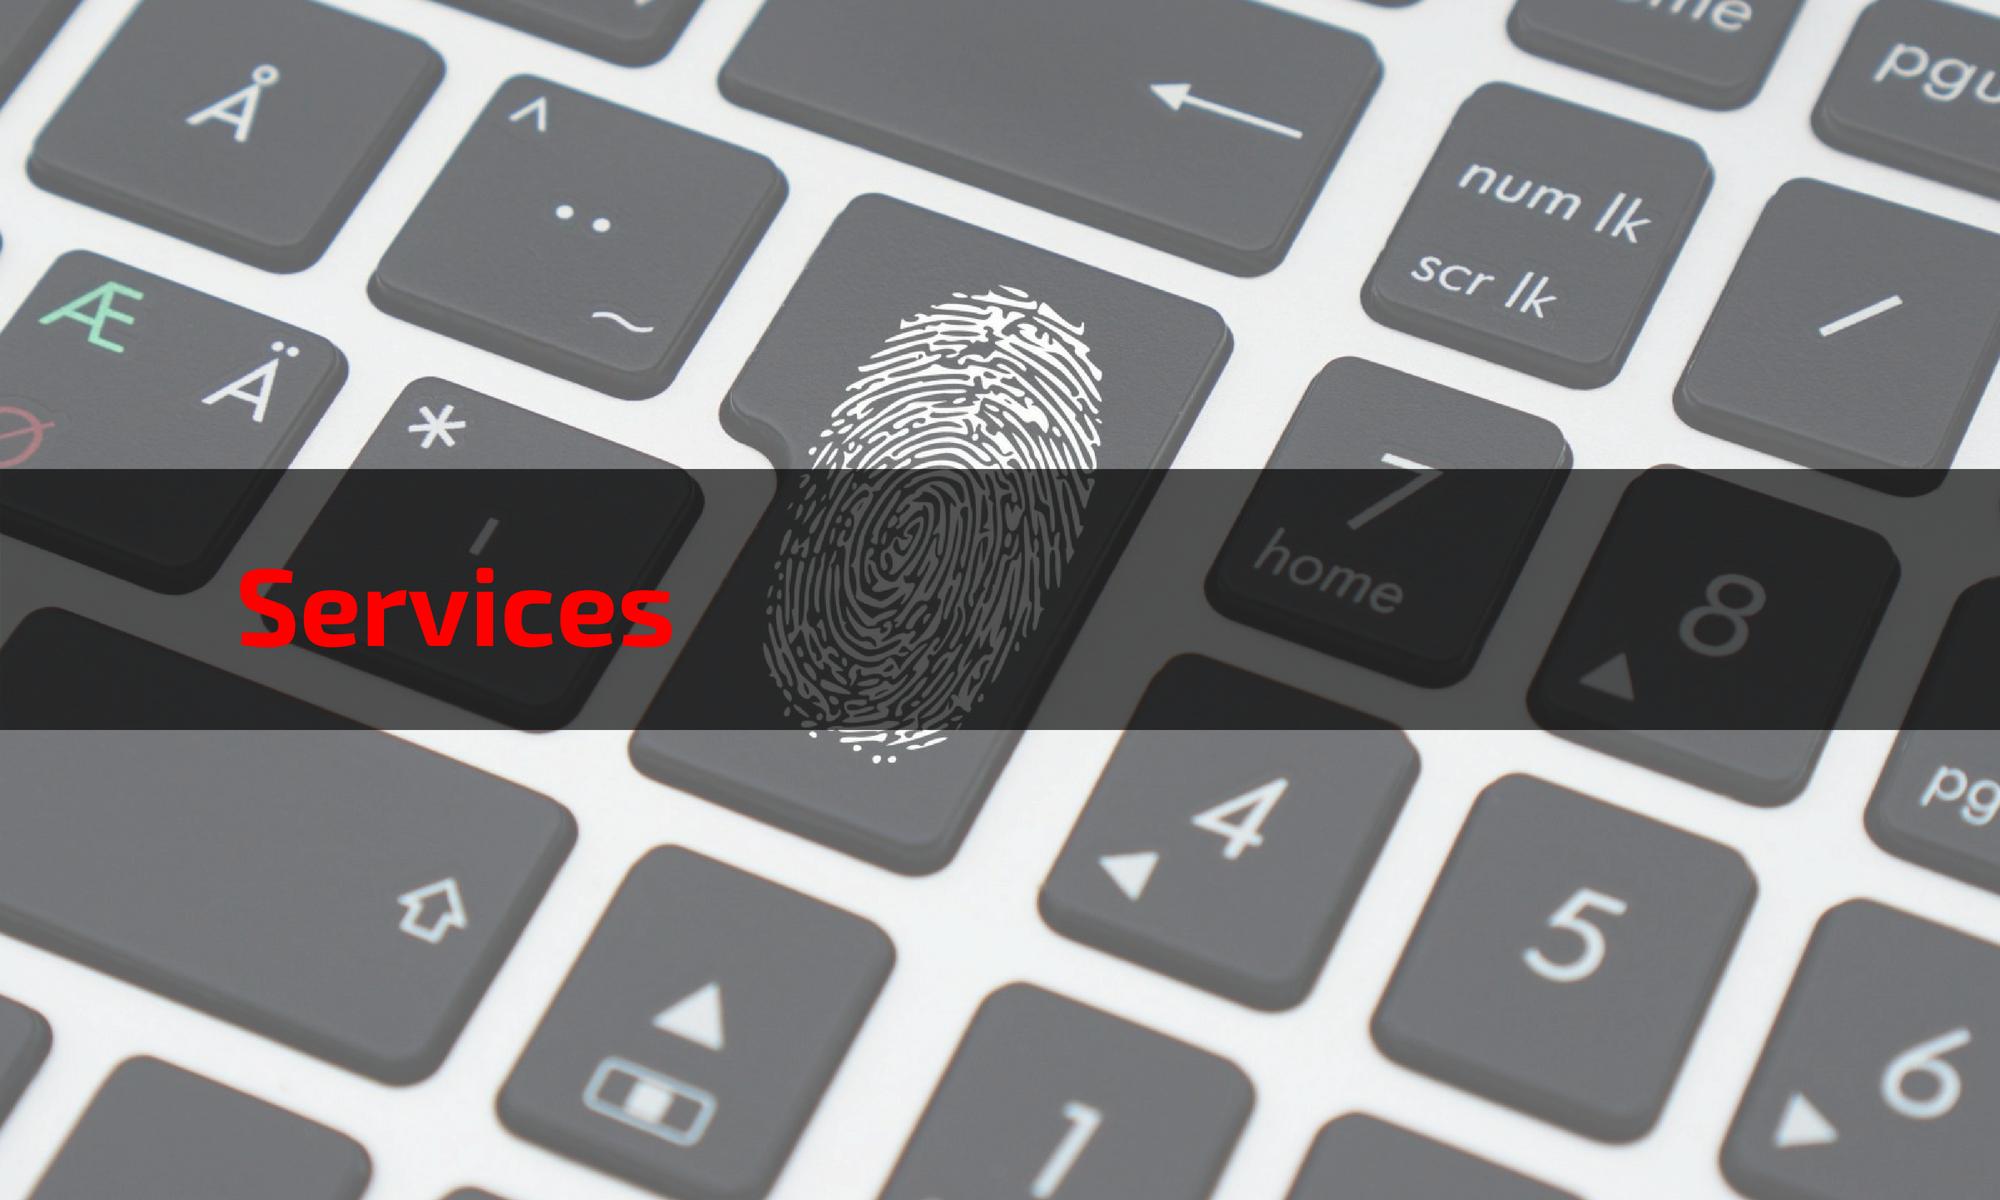 Services - Services